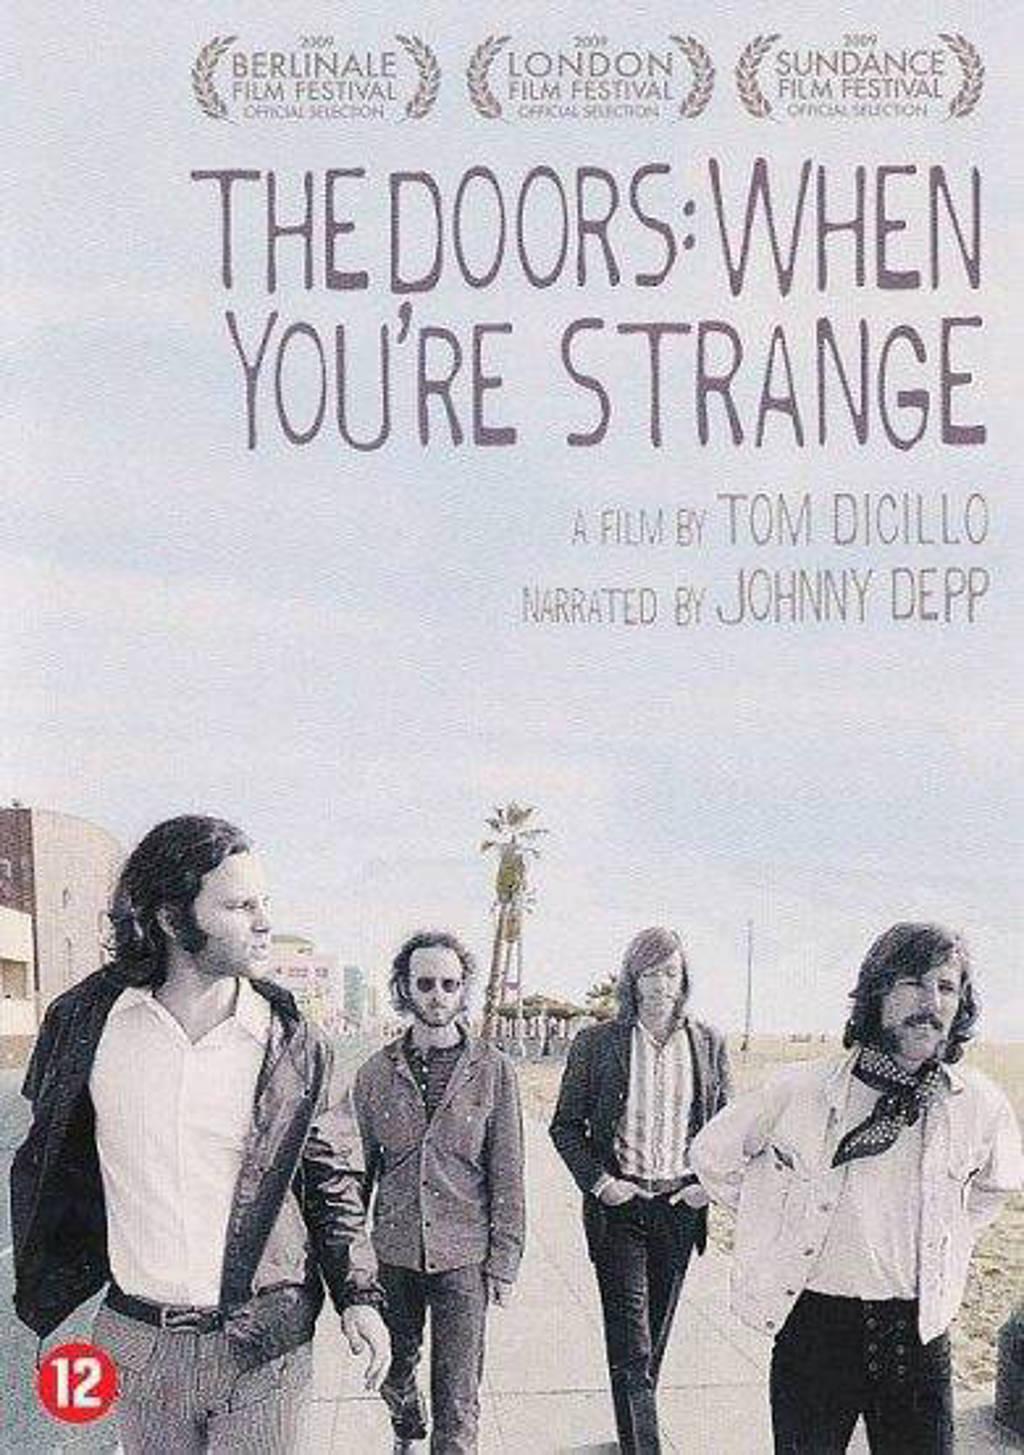 The Doors - When you're strange (DVD)